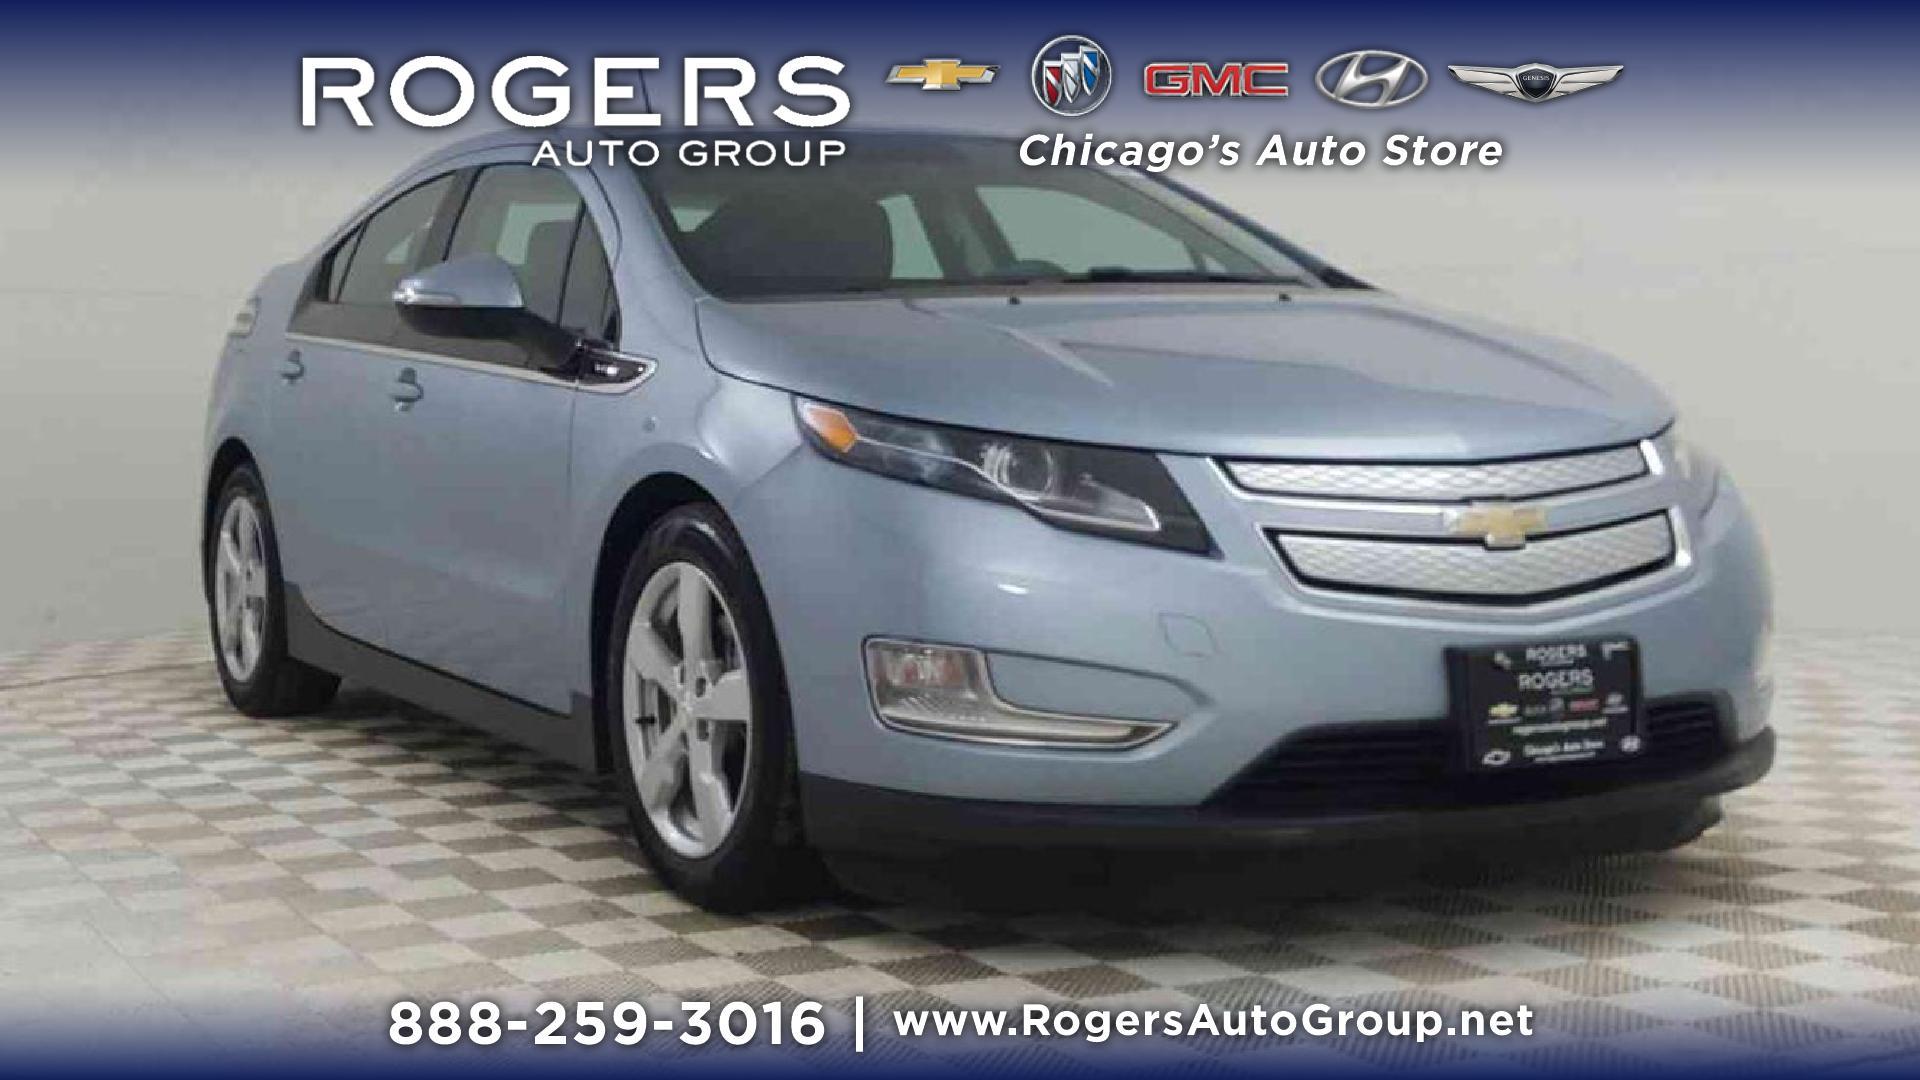 Inventory at Rogers Hyundai Chicago